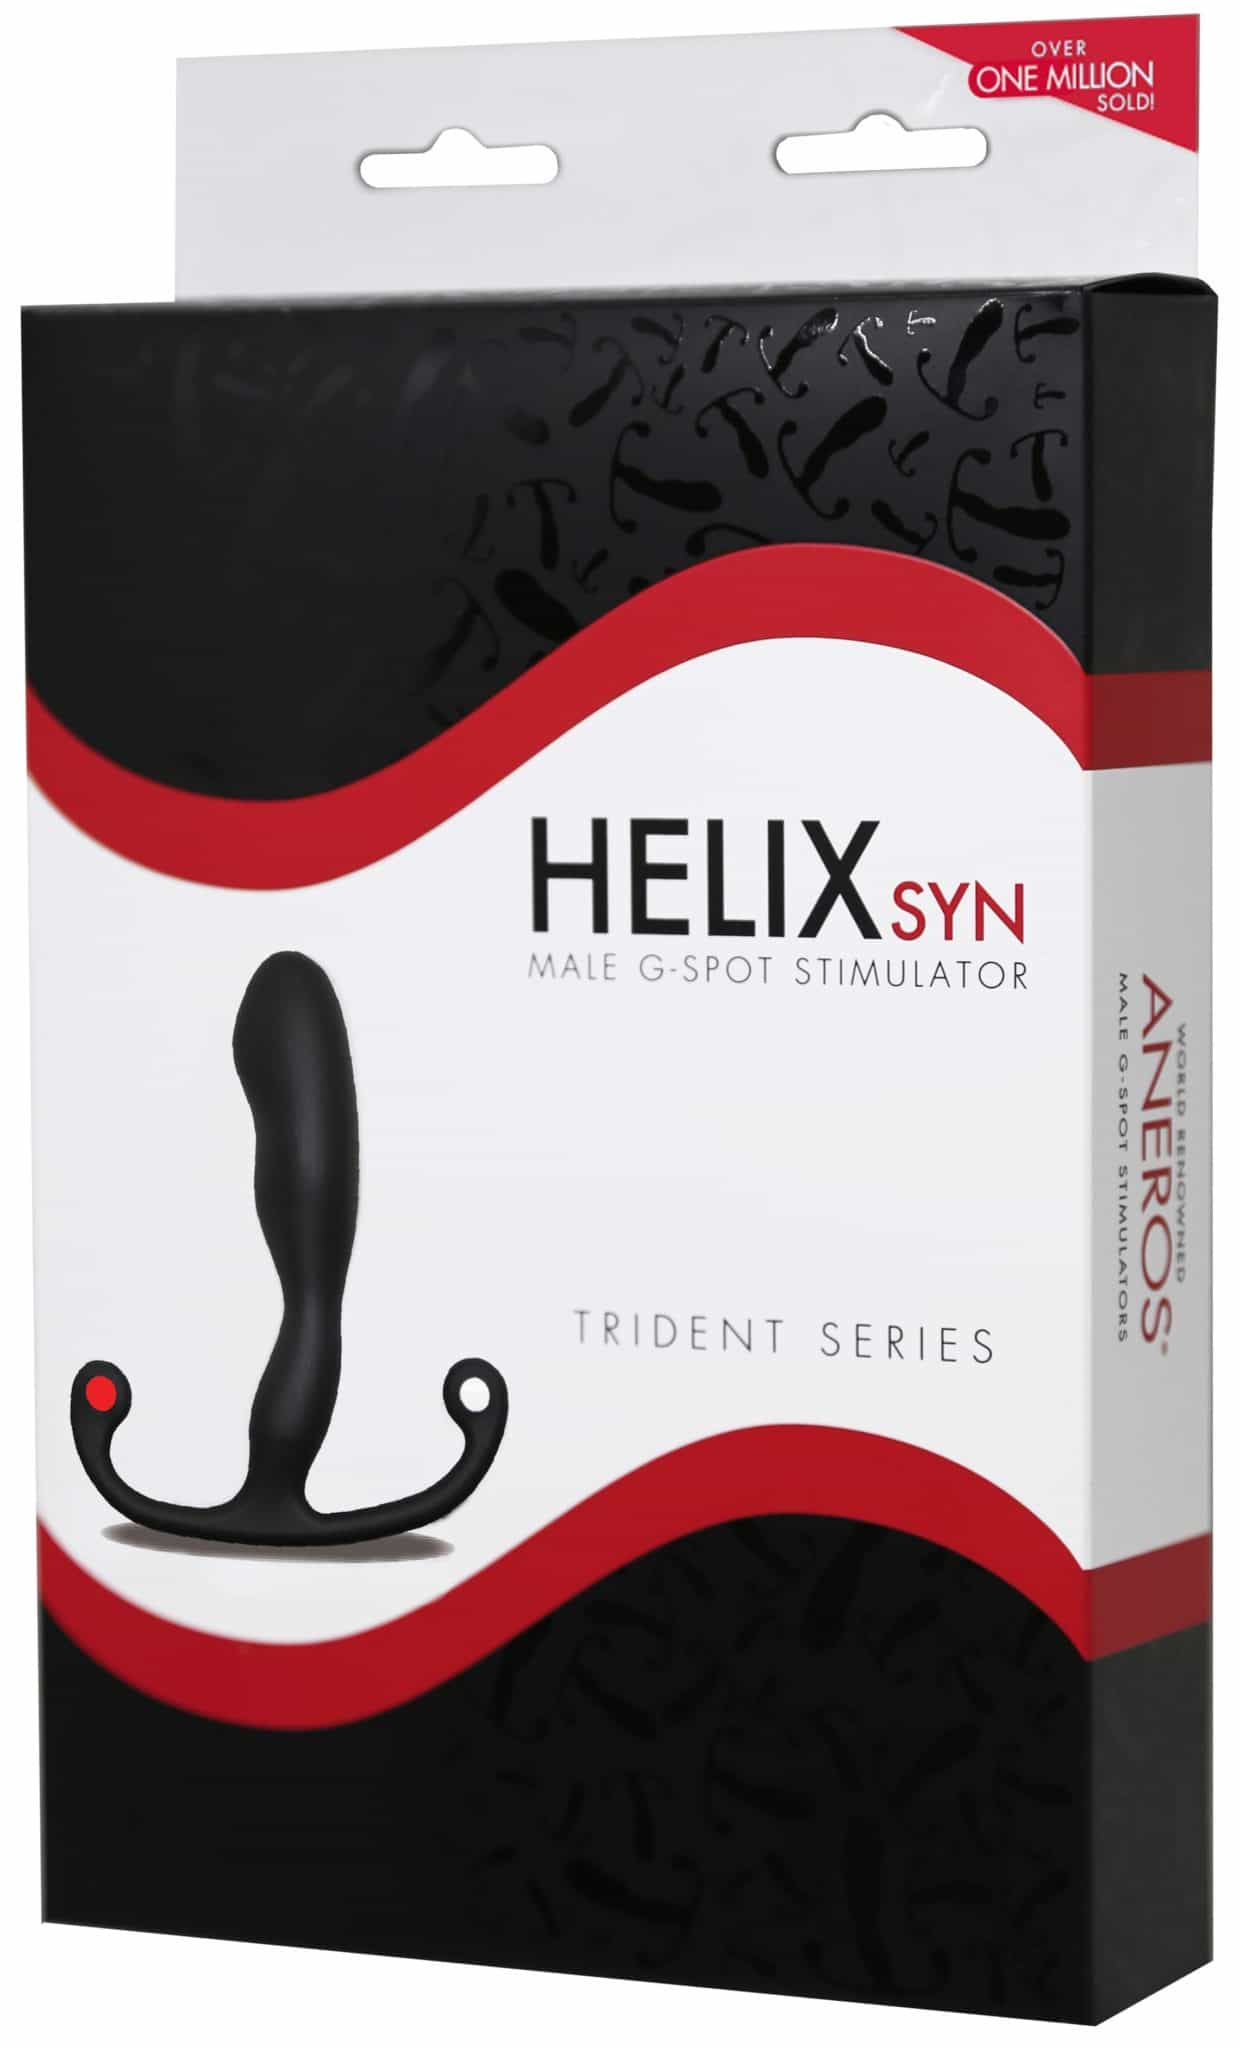 Aneros Helix SYN Trident Series Prostate Stimulator